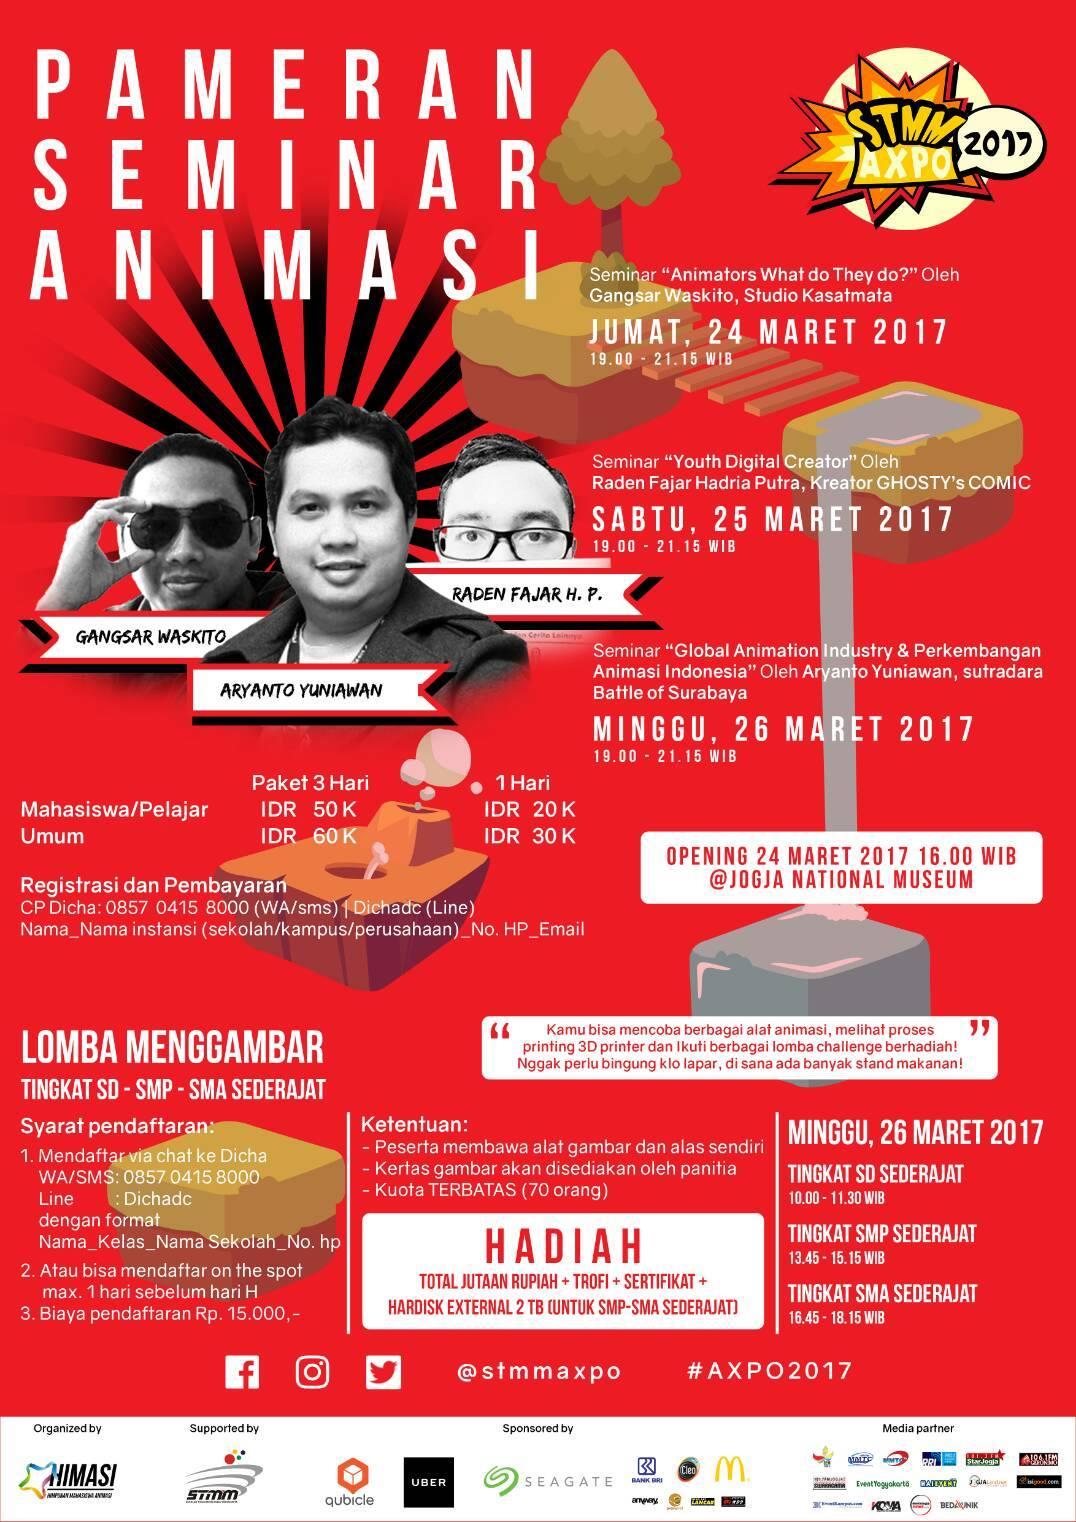 PAMERAN SEMINAR ANIMASI : STMM AXPO 2017